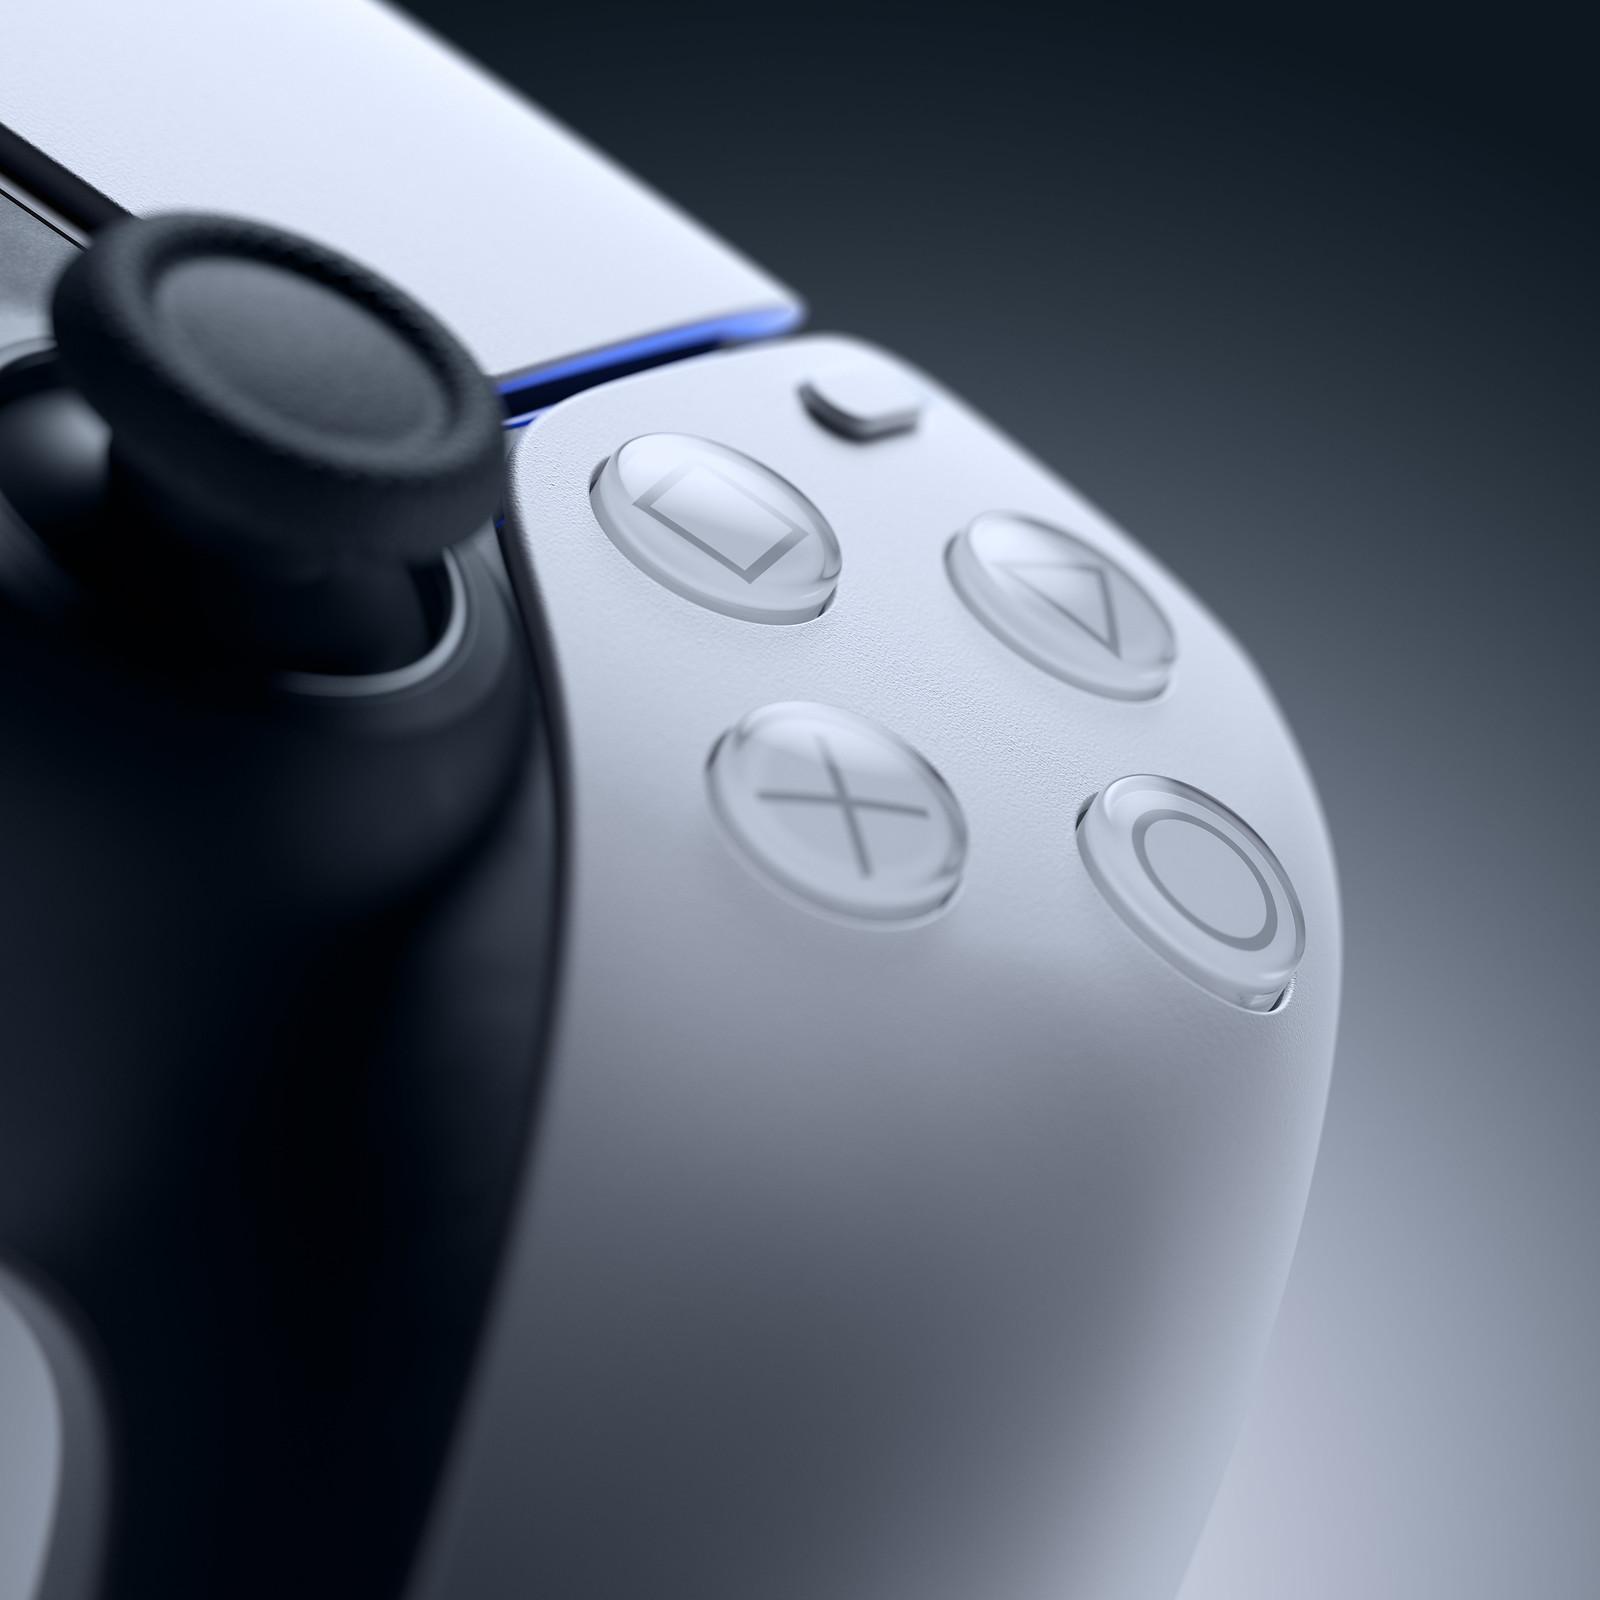 Playstation Zubehör PS5 Controller